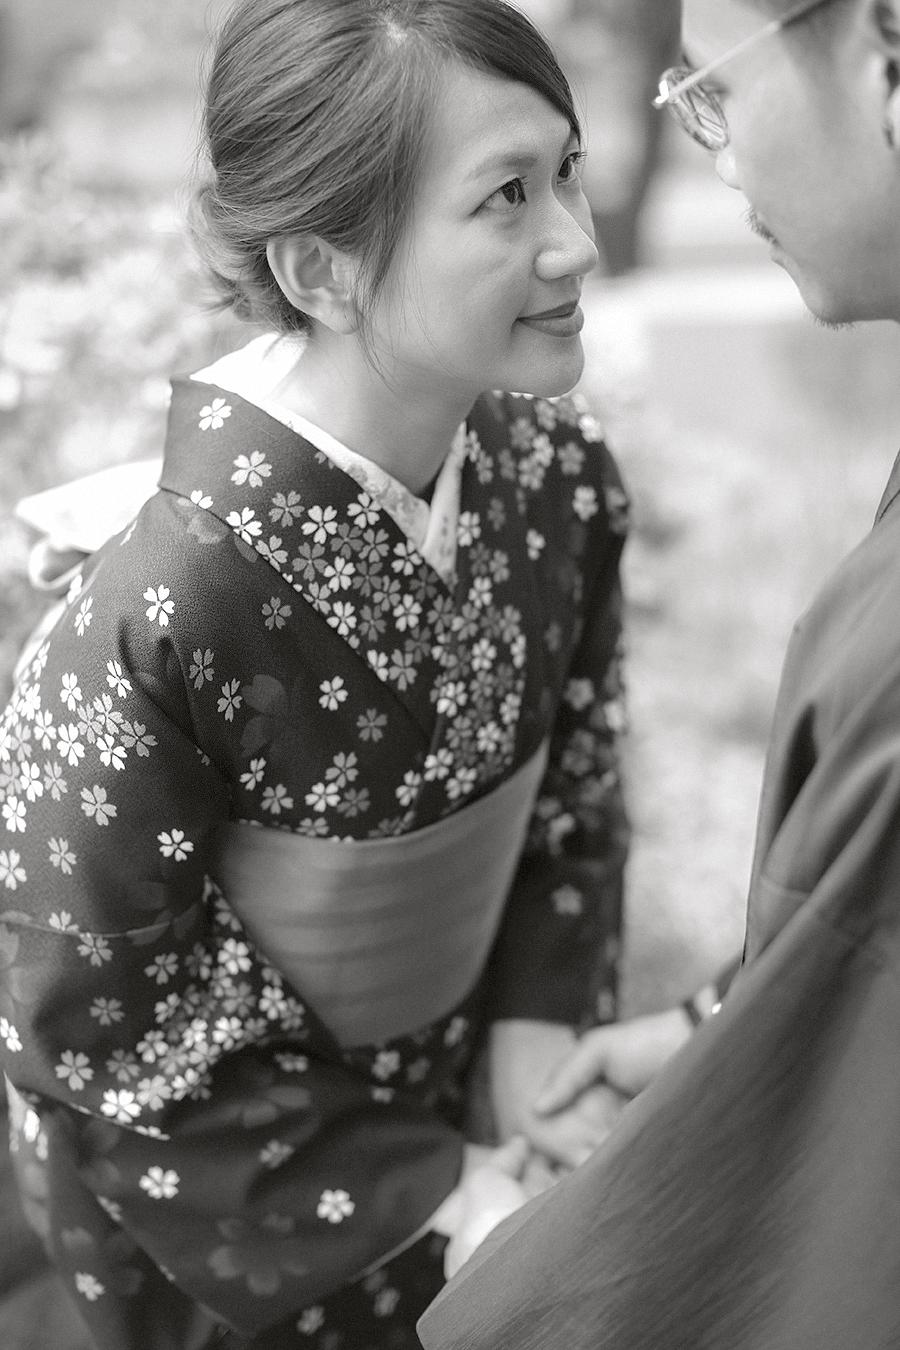 tokyo hakone japan spring sakura . engagement wedding photography by kurt ahs . ns + eu . 0414.jpg